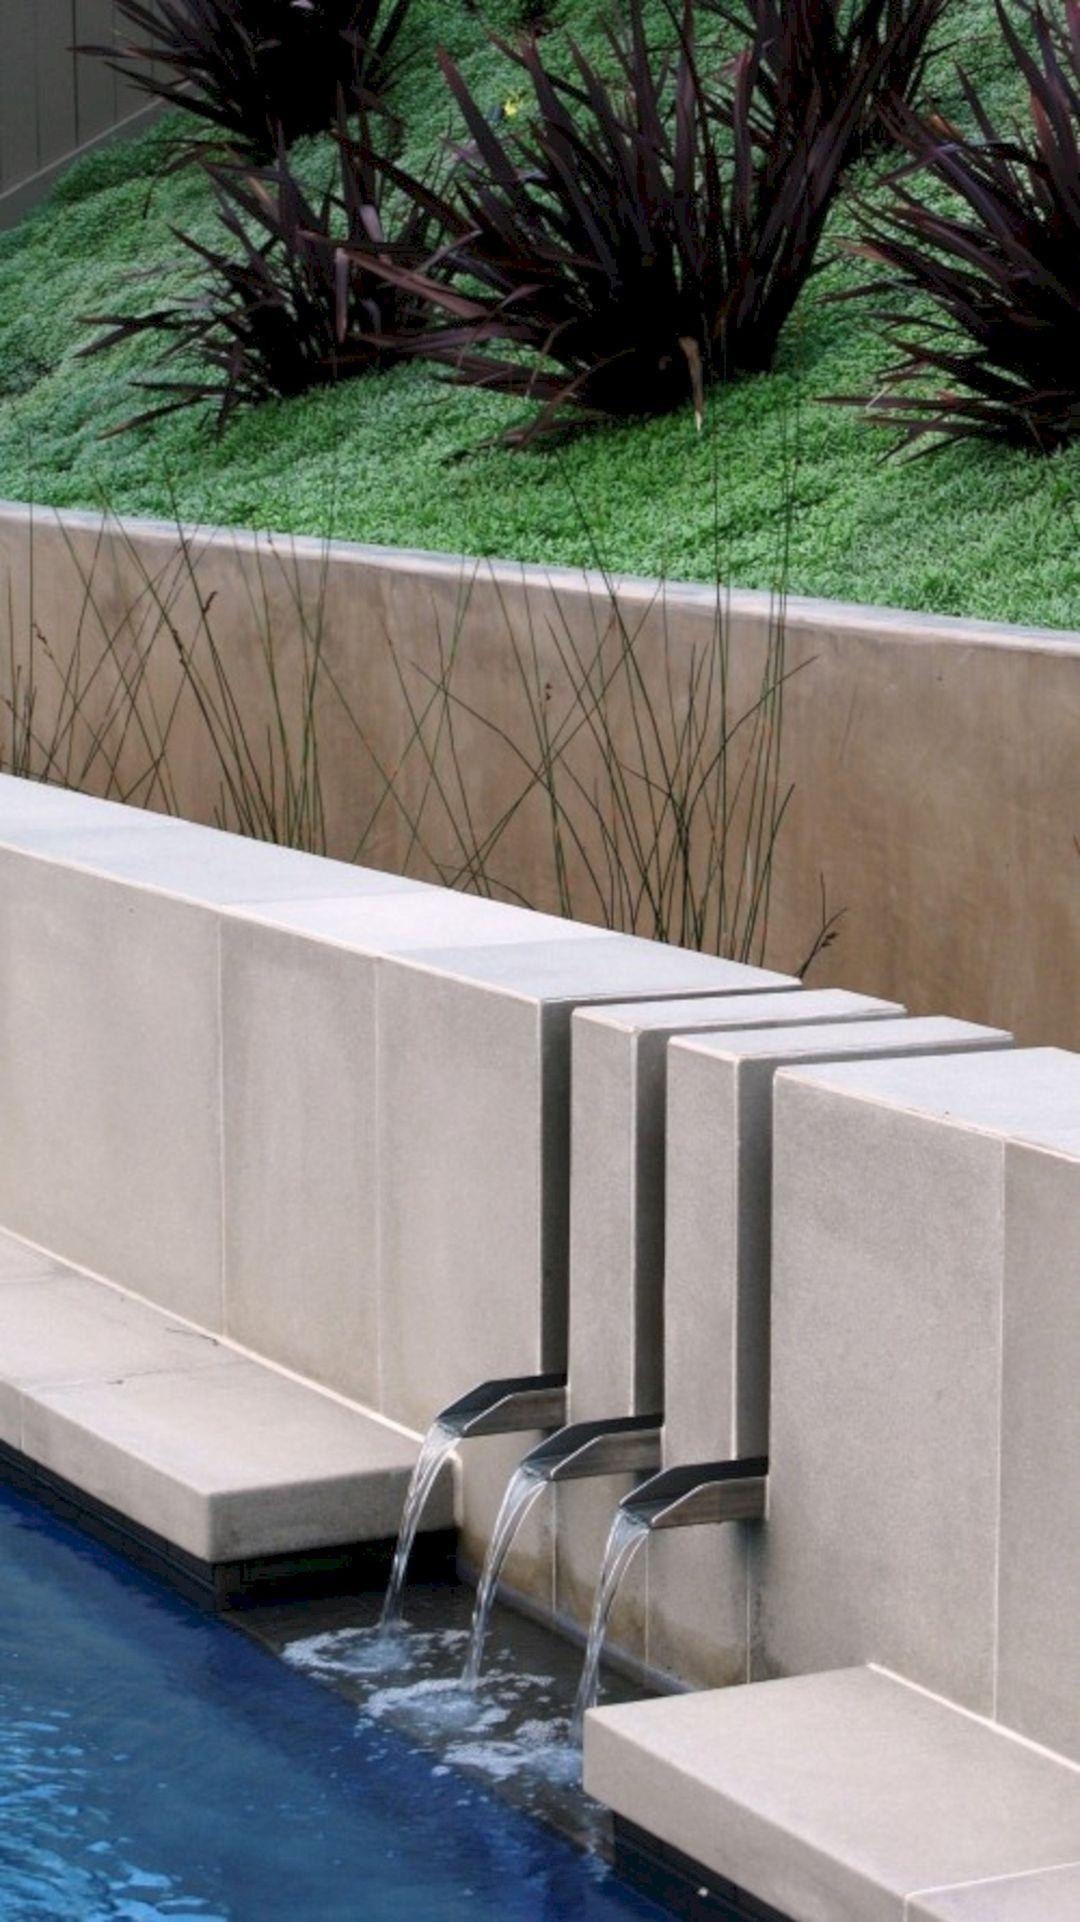 Inspiring 12 Wonderful Fountain Design For Your Home Garden Ideas Https Decoredo C Contemporary Landscape Design Water Features In The Garden Fountain Design